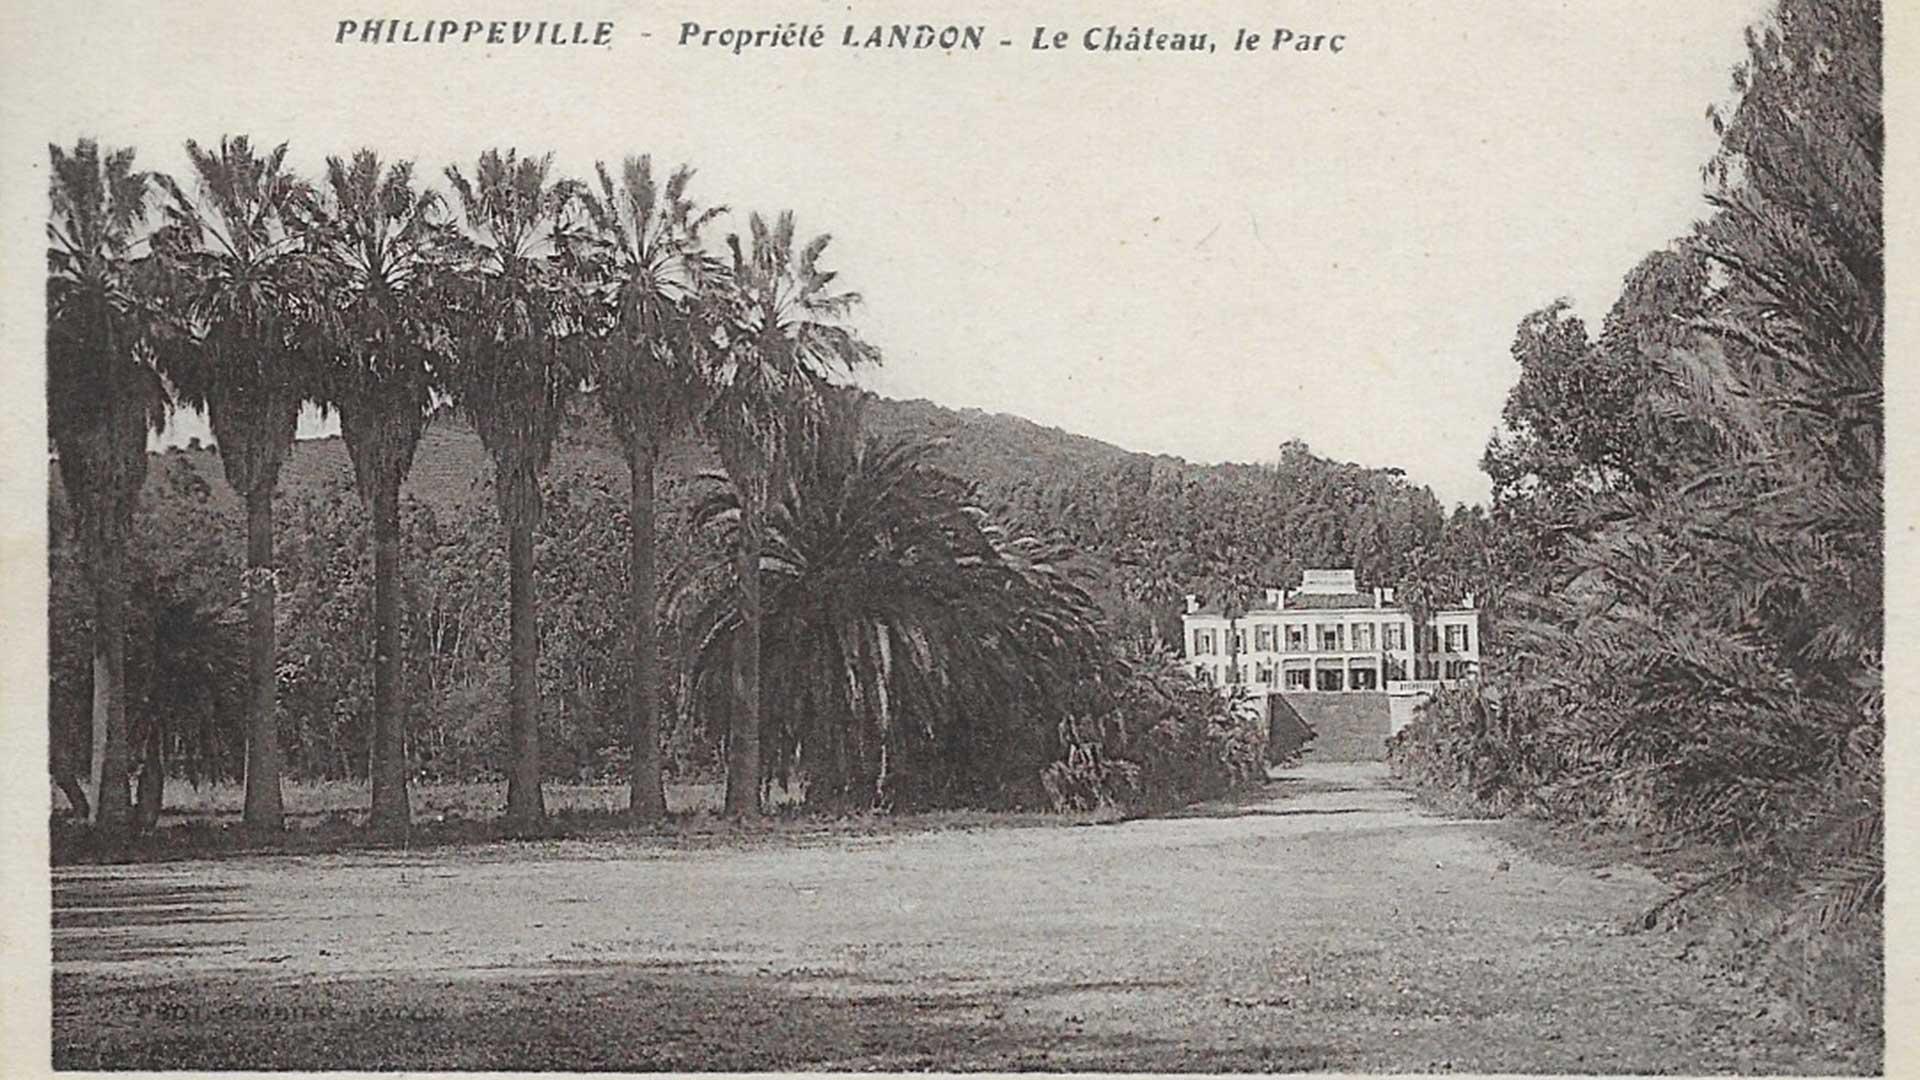 Philippeville-Propriete-Landon